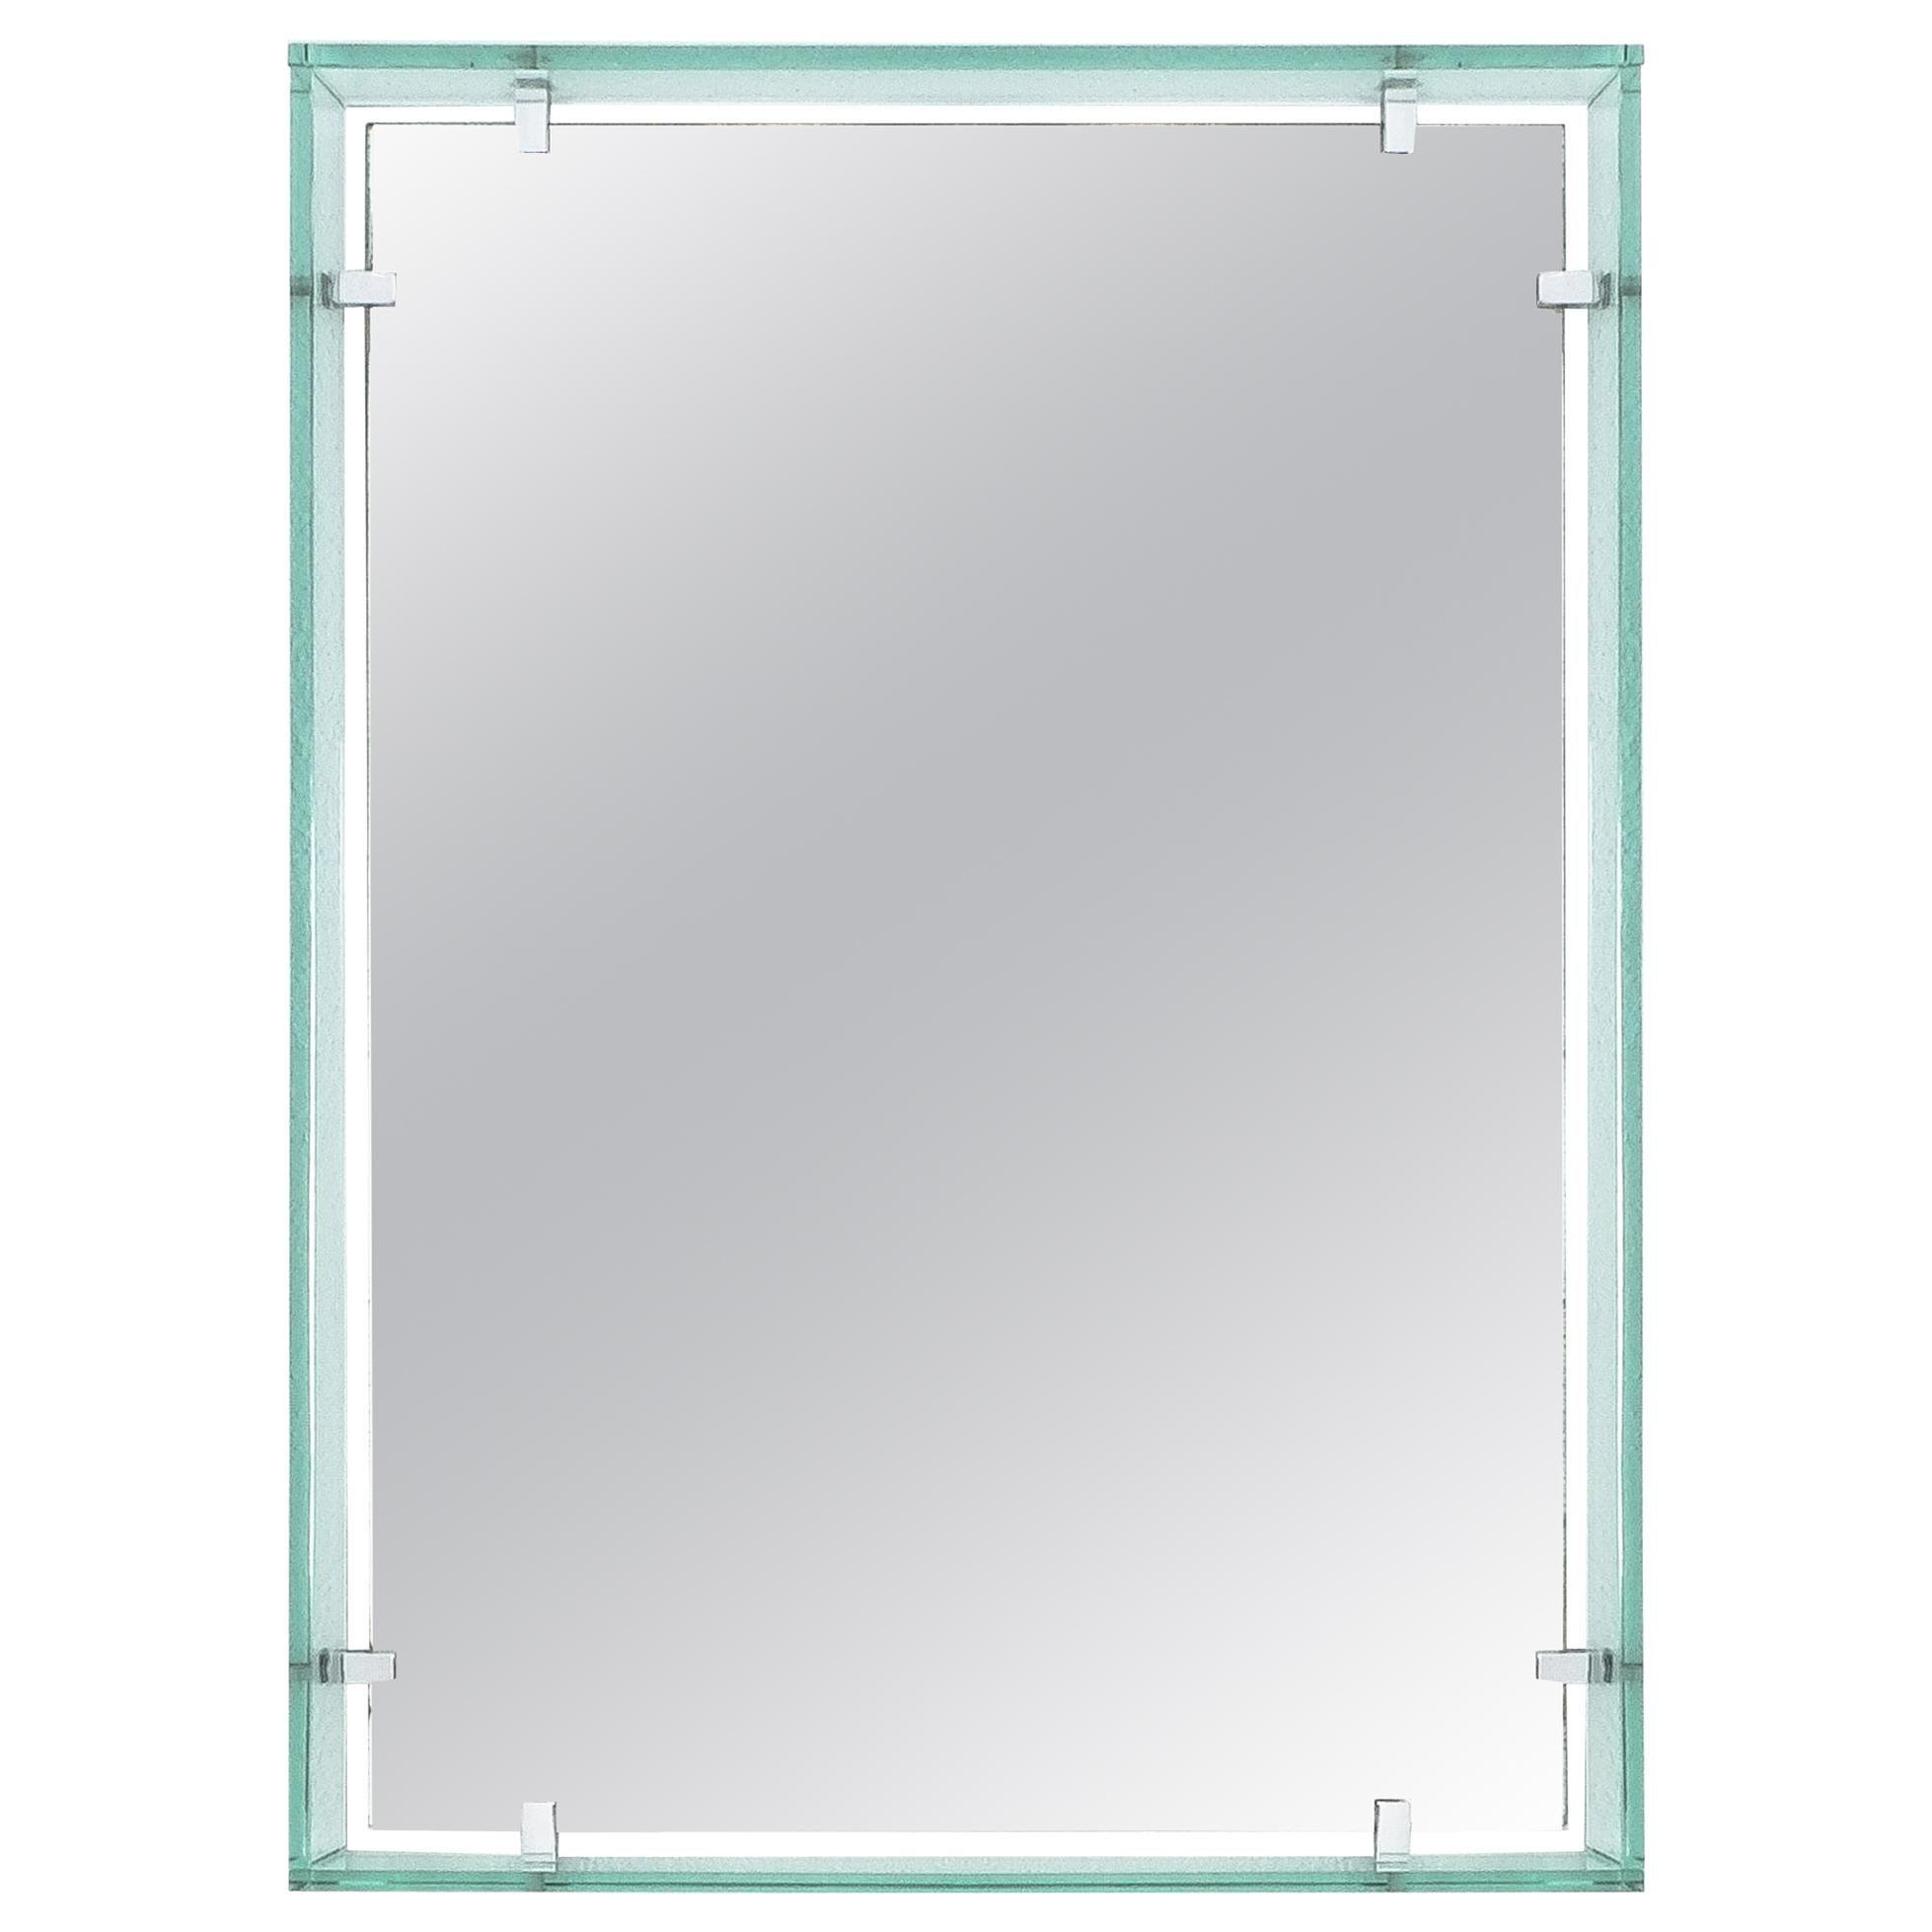 Rectangular Floating Glass Mirror By Fontana Arte Model 2014